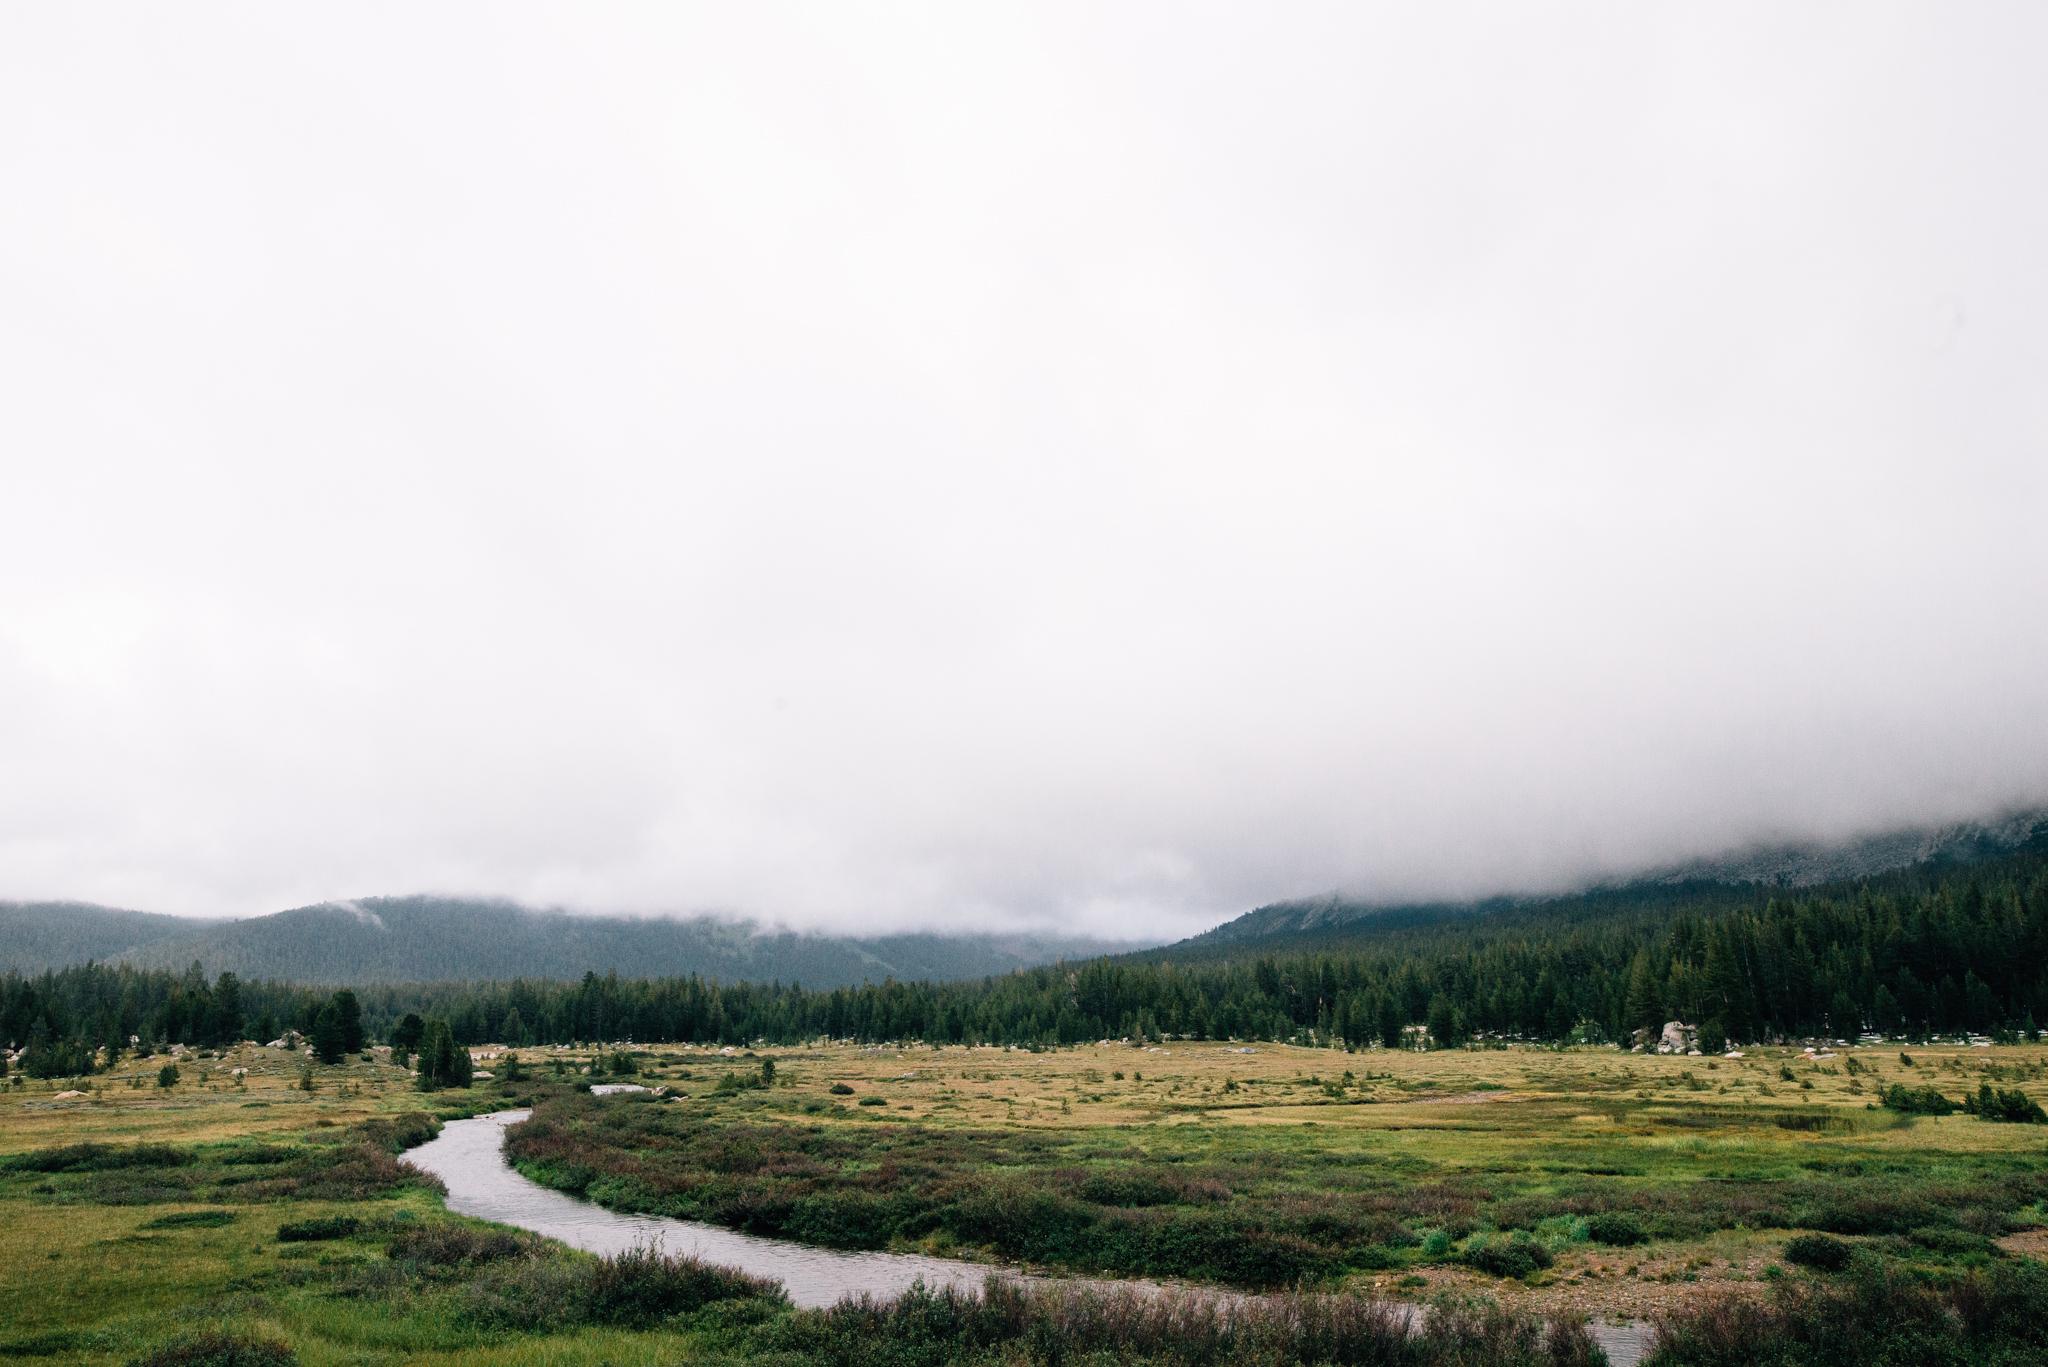 ©The Ryans Photography - Los Angeles Travel - Tuolomne Meadows Yosemite-012.jpg